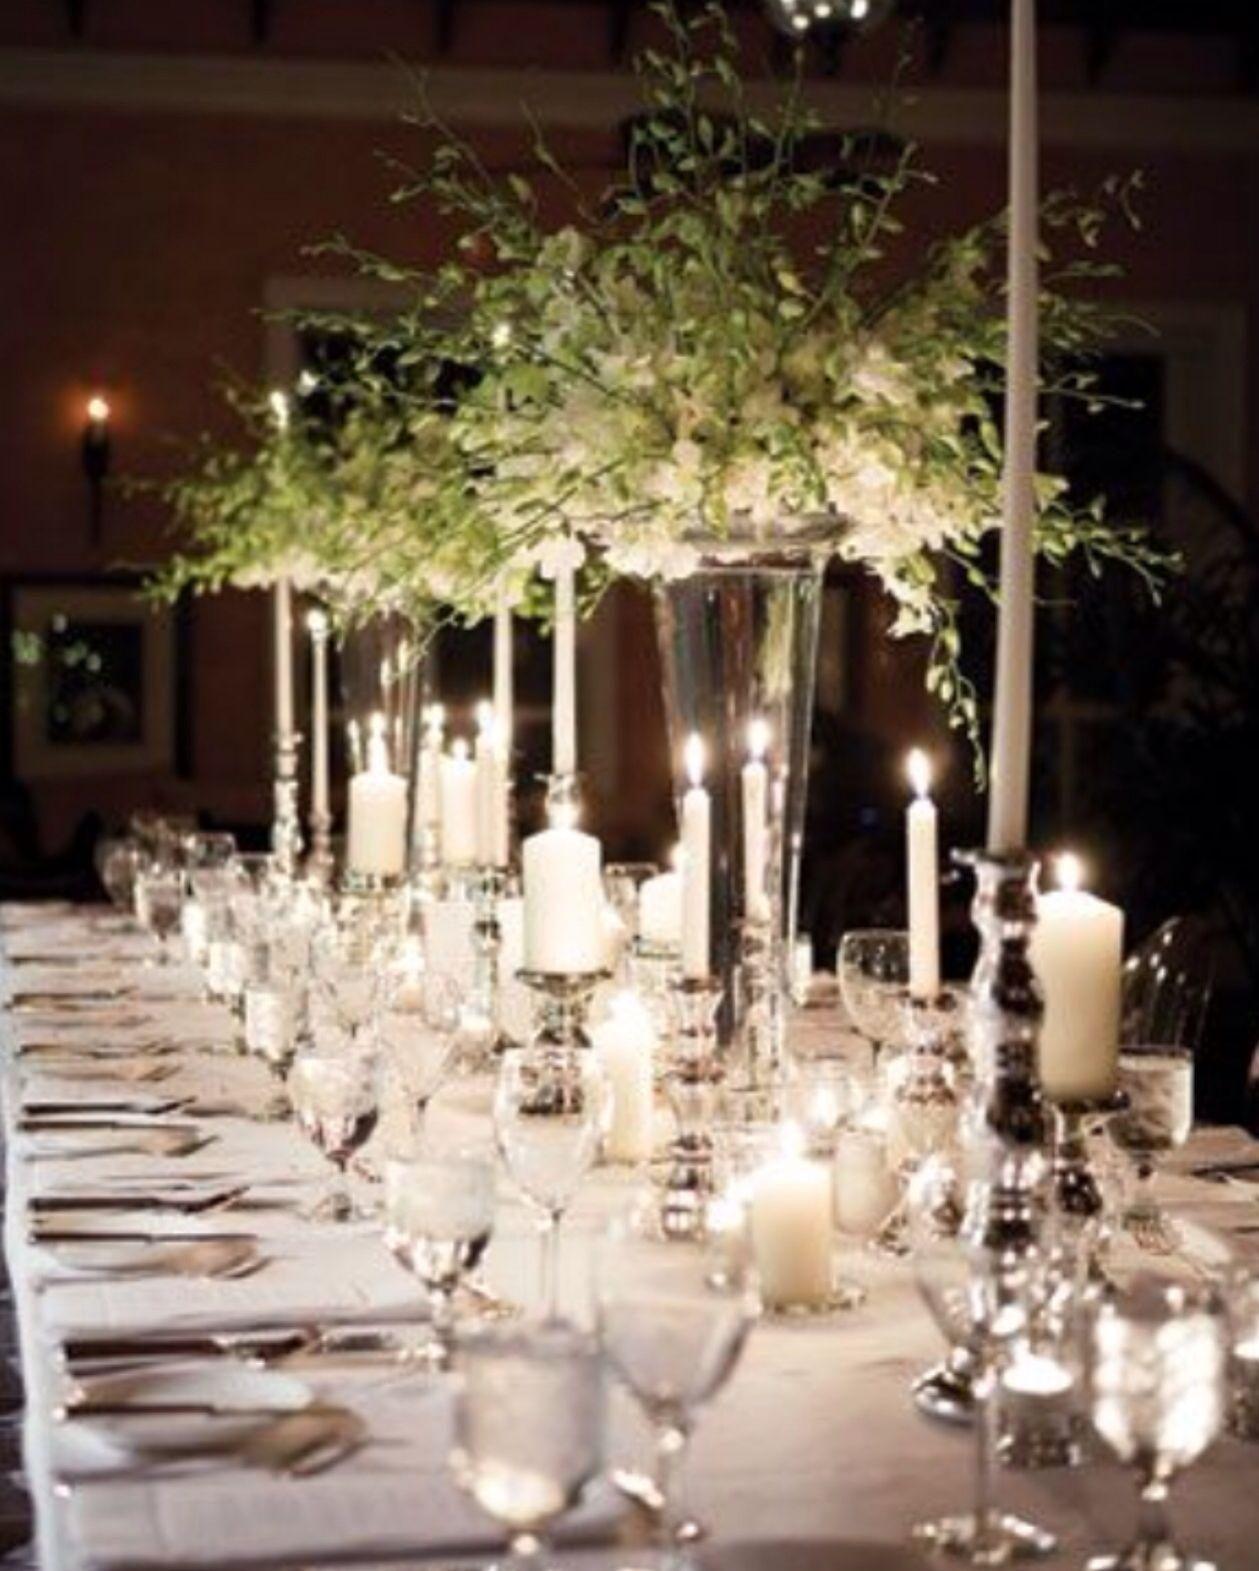 Black and white wedding decor ideas  More formal  Deko  Pinterest  Wedding